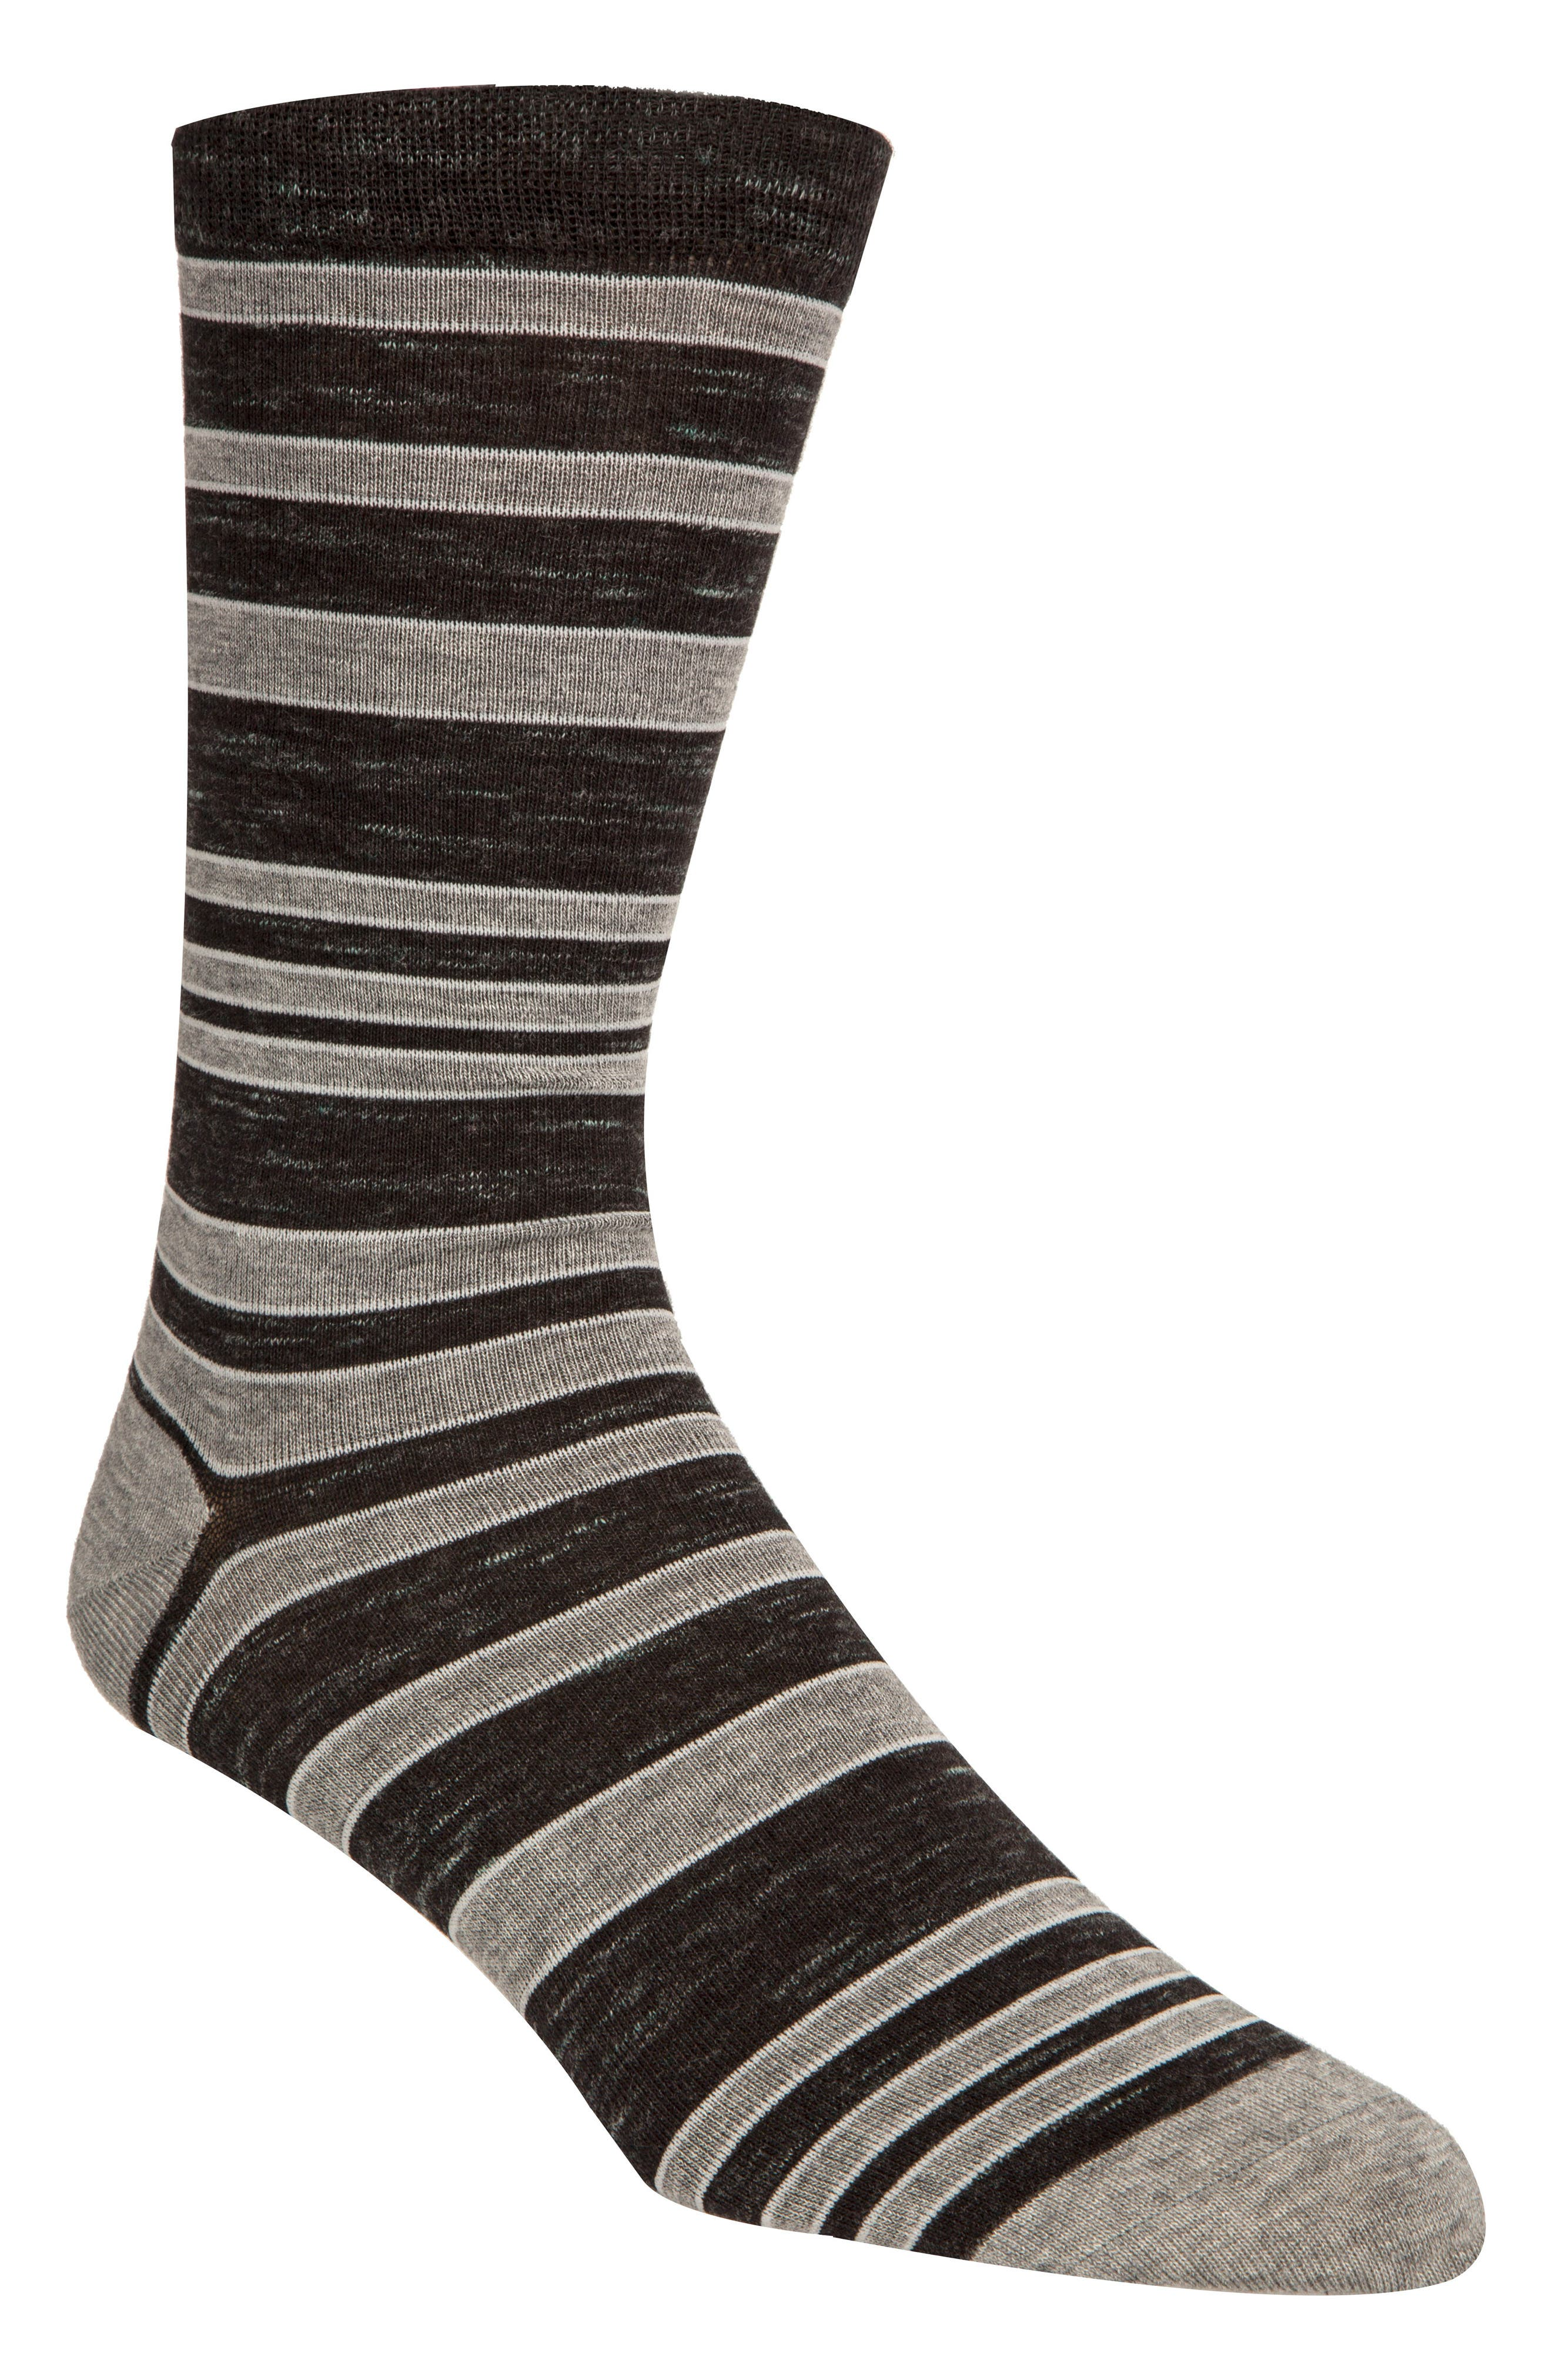 Stripe Socks,                         Main,                         color, Black Rain Heather